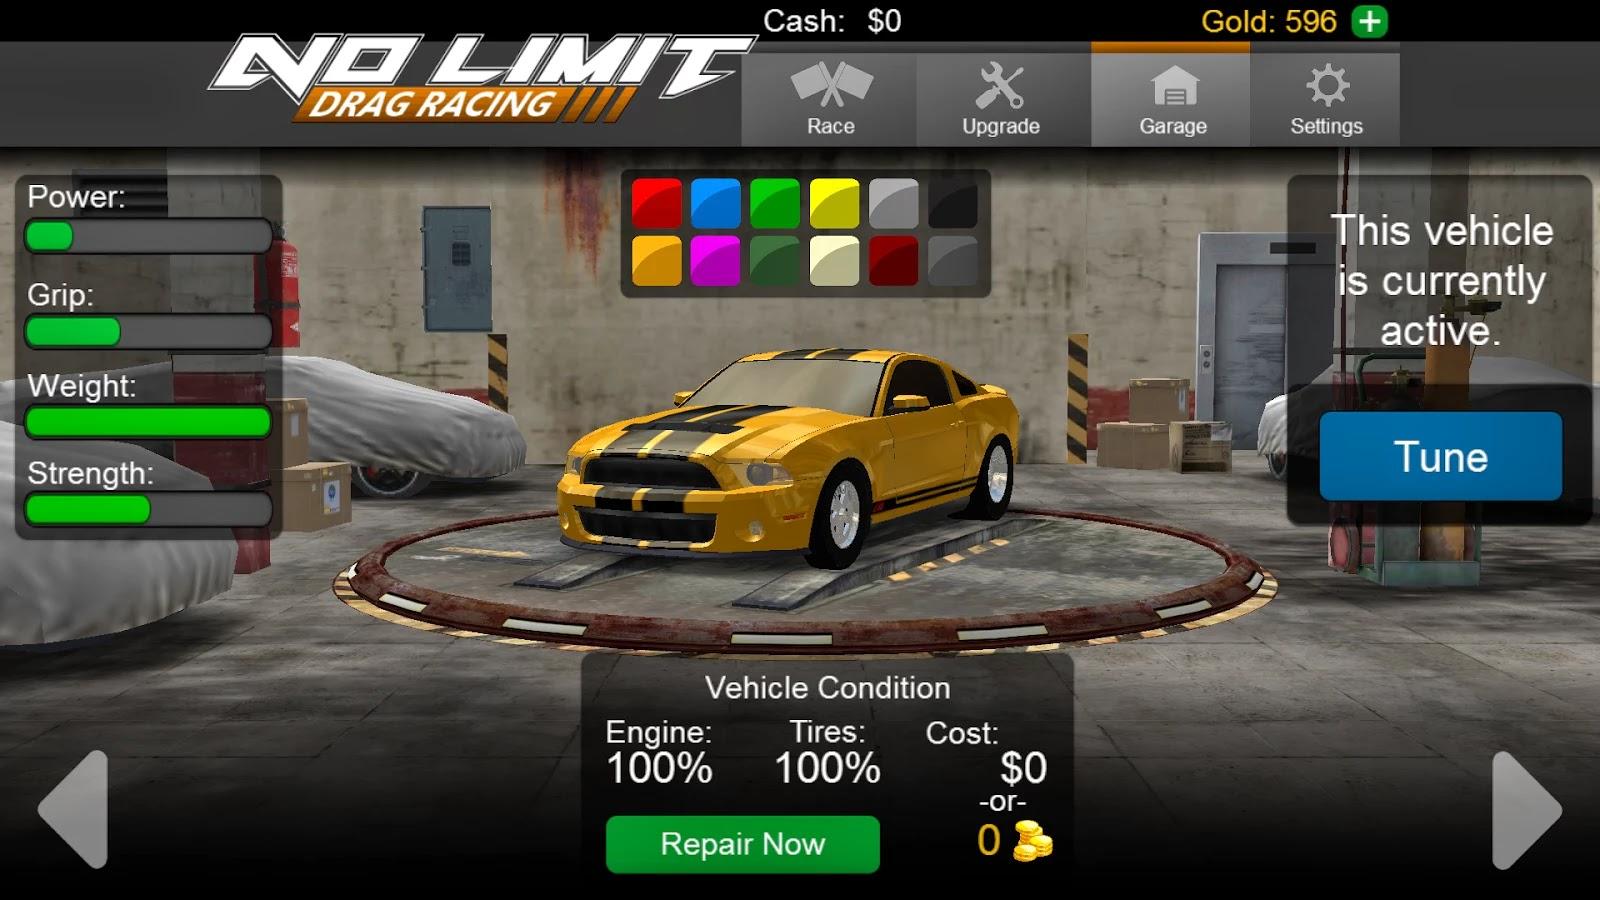 Door Slammers Drag Racing App For Iphone Free Page 2  Apps